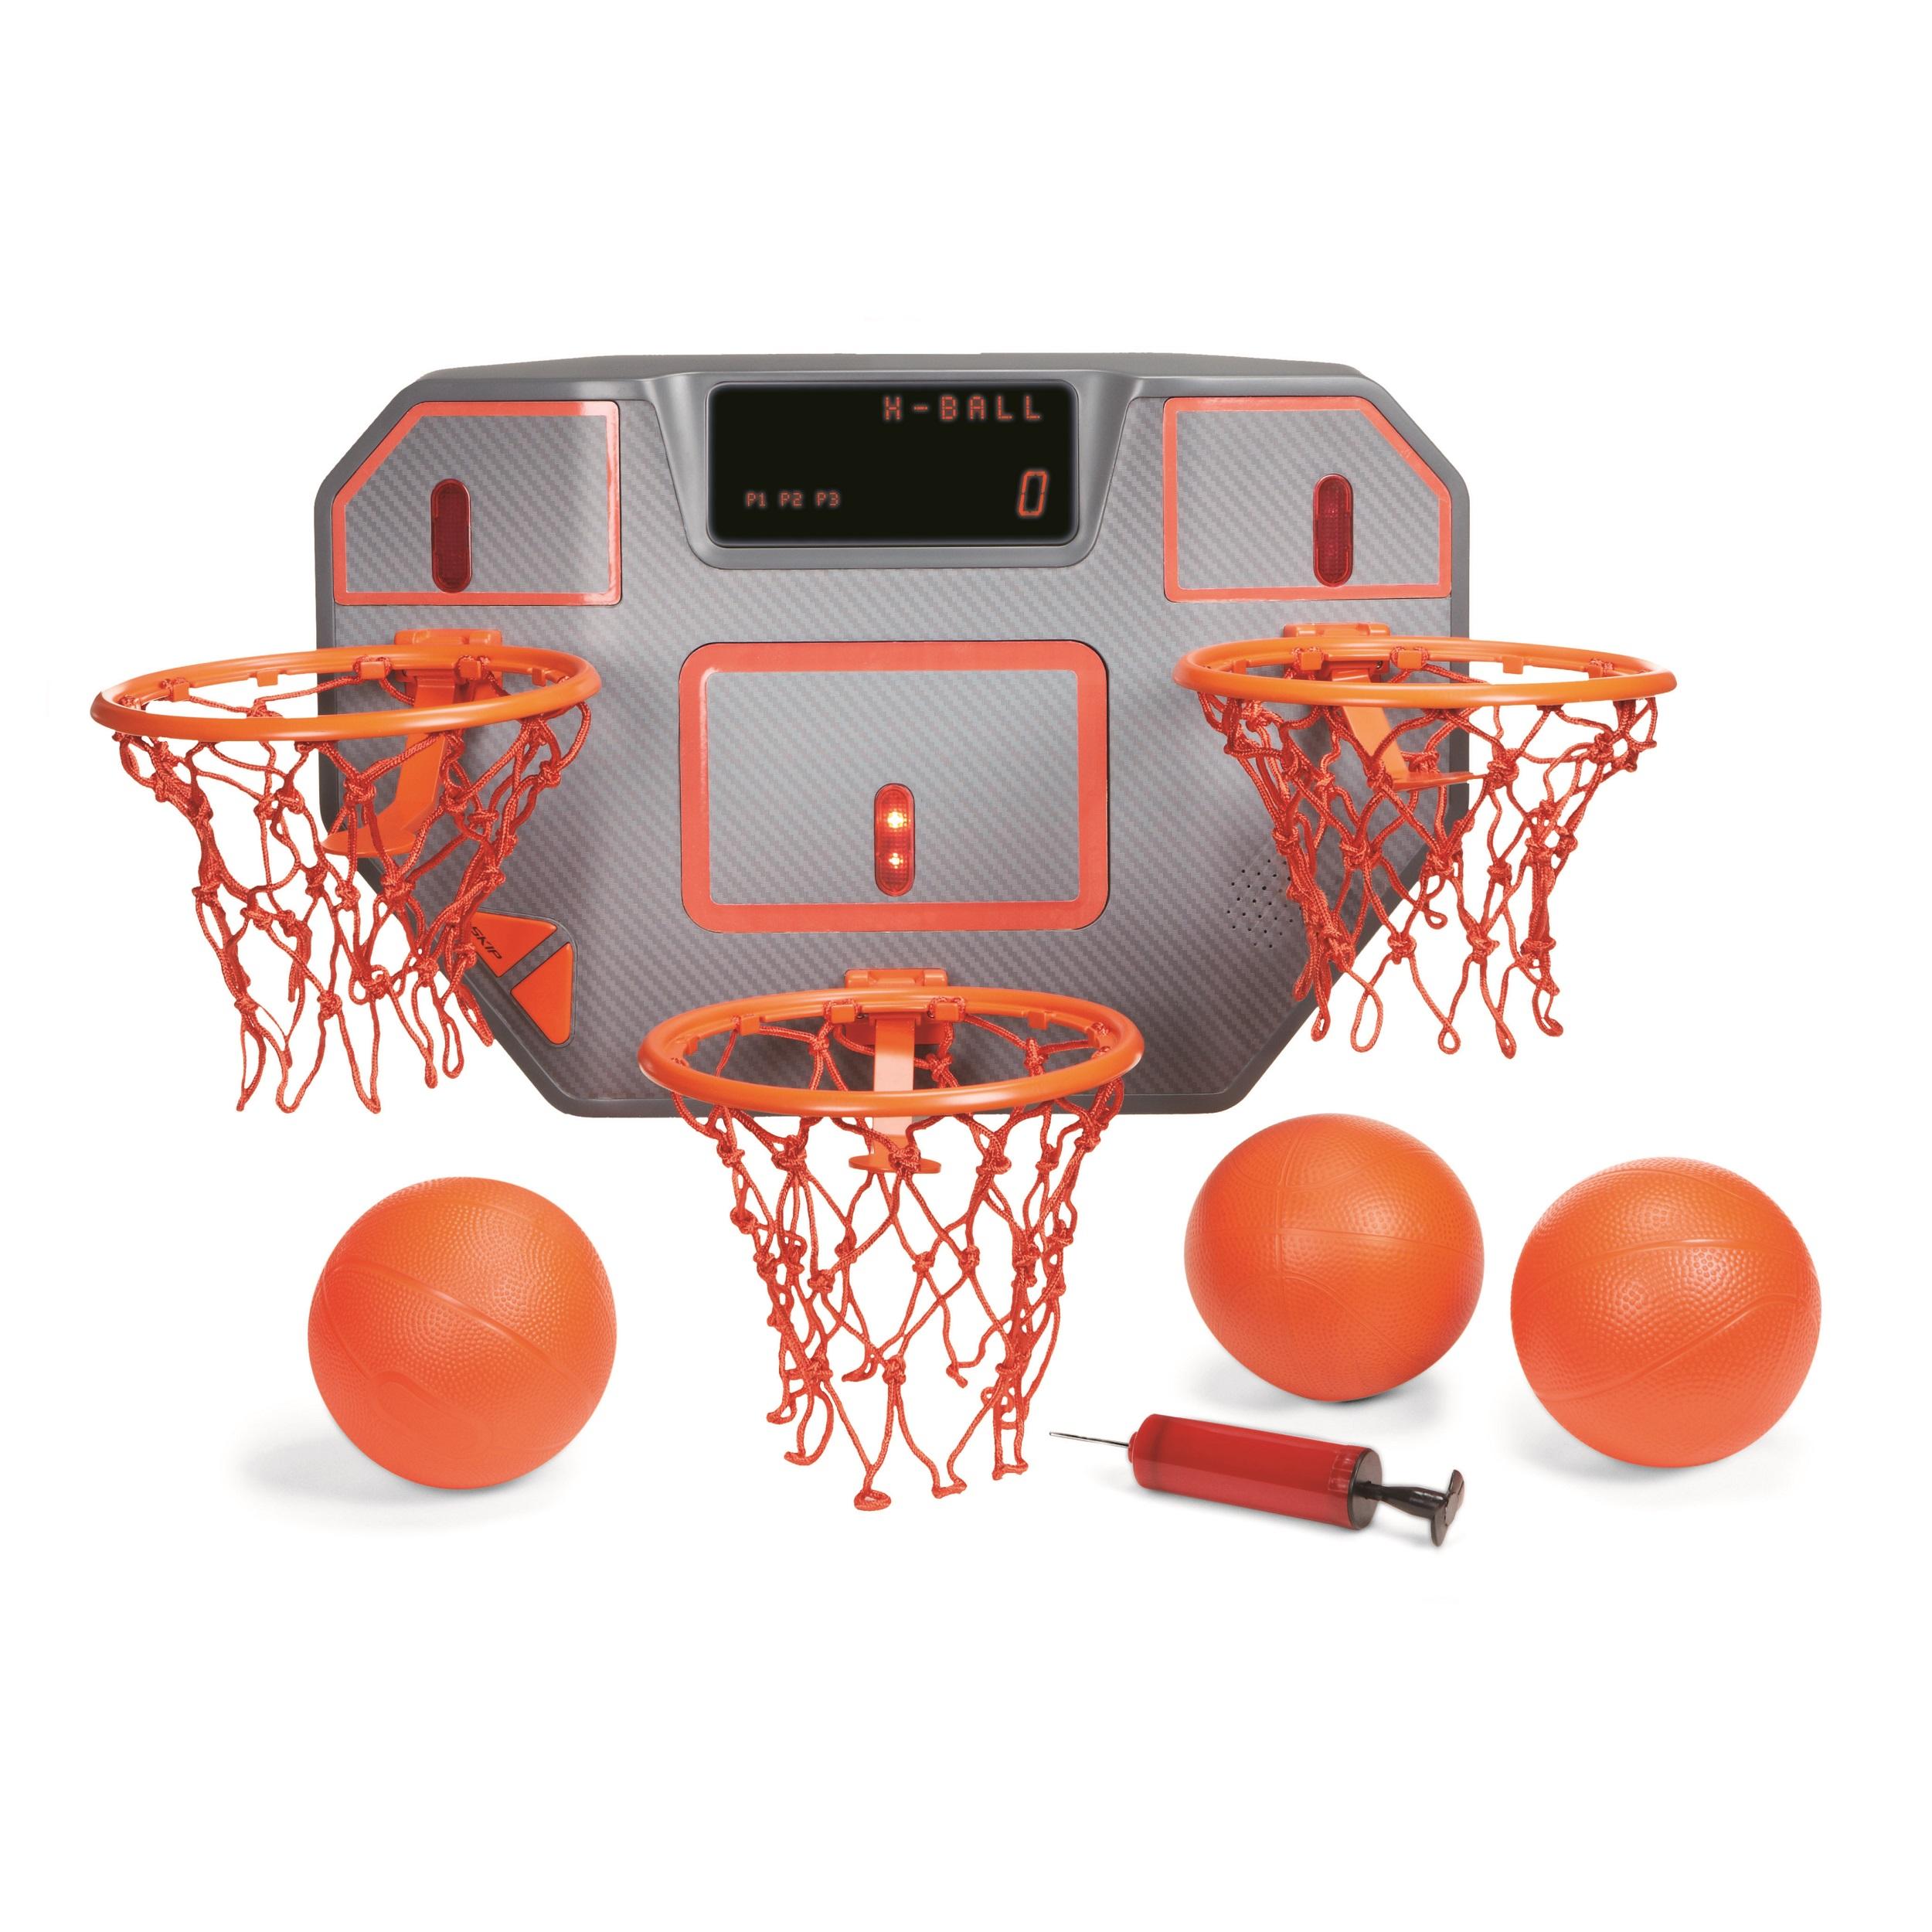 Game Point Triple Shot Challenge (Indoor Basketball)